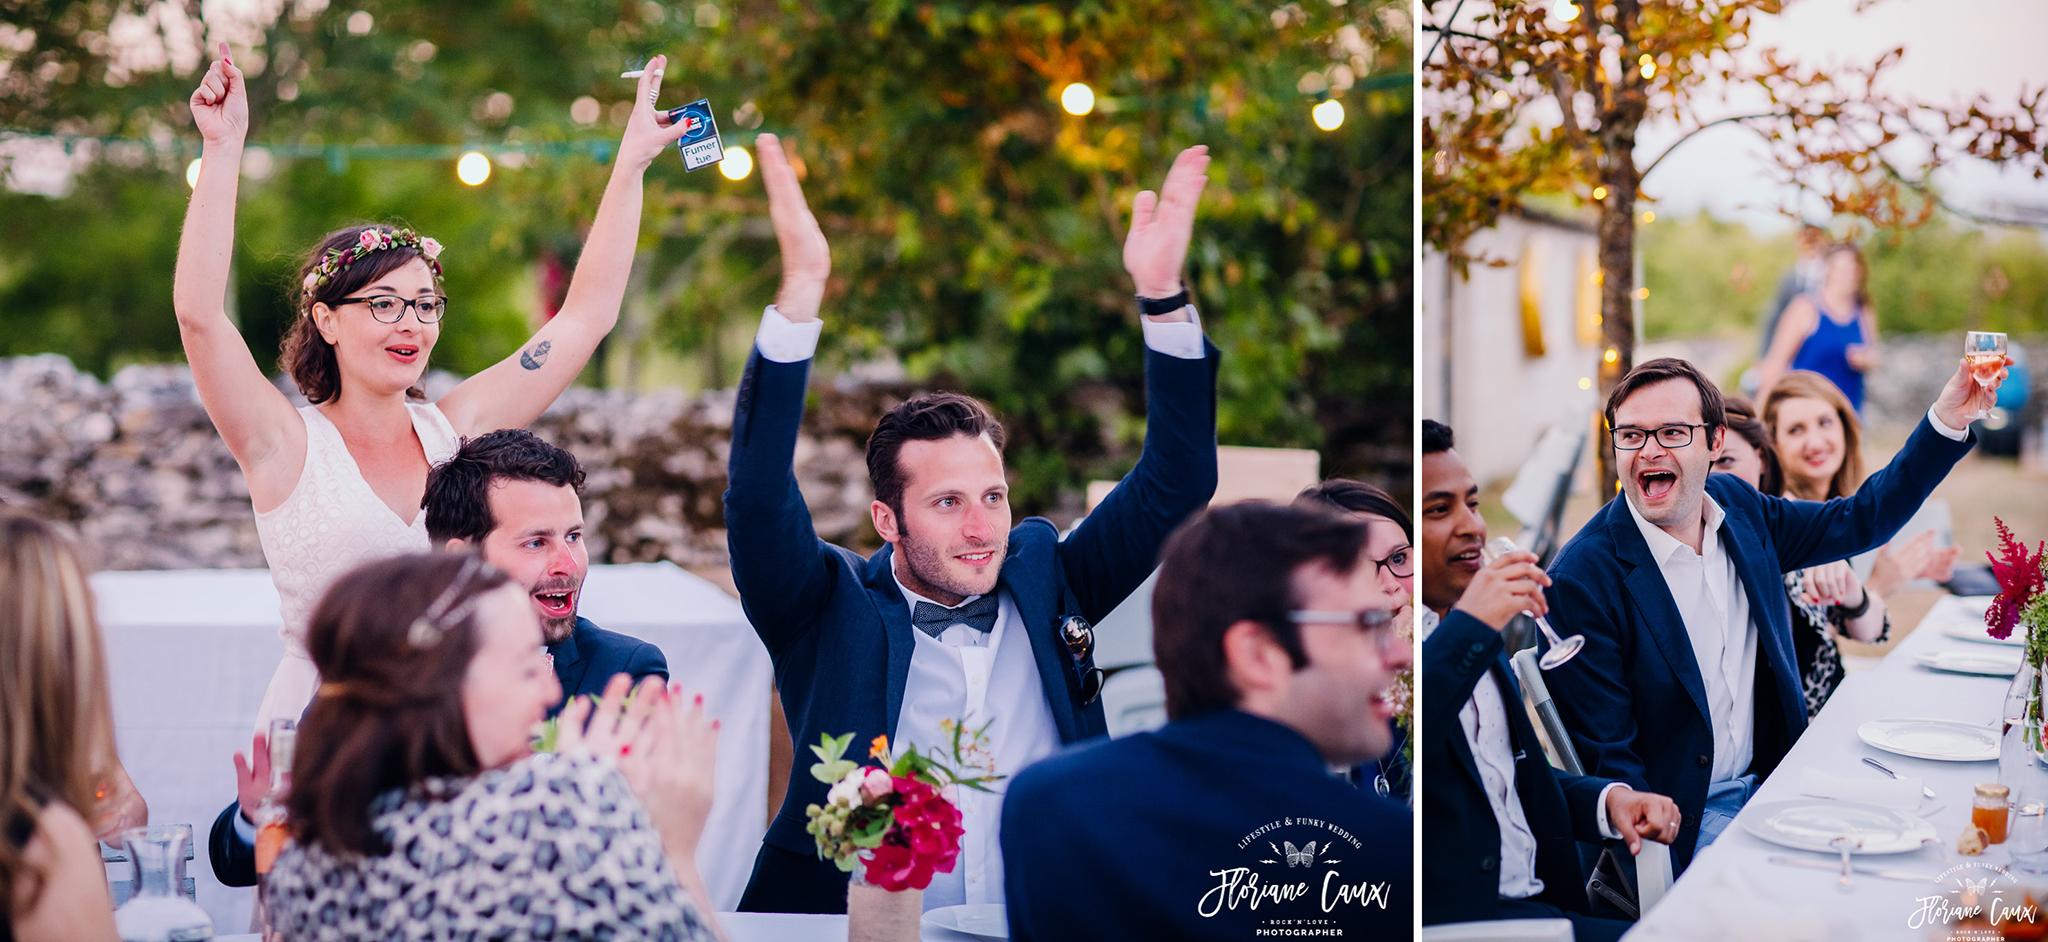 my-dear-festival-party-mariage-chez-soi-2